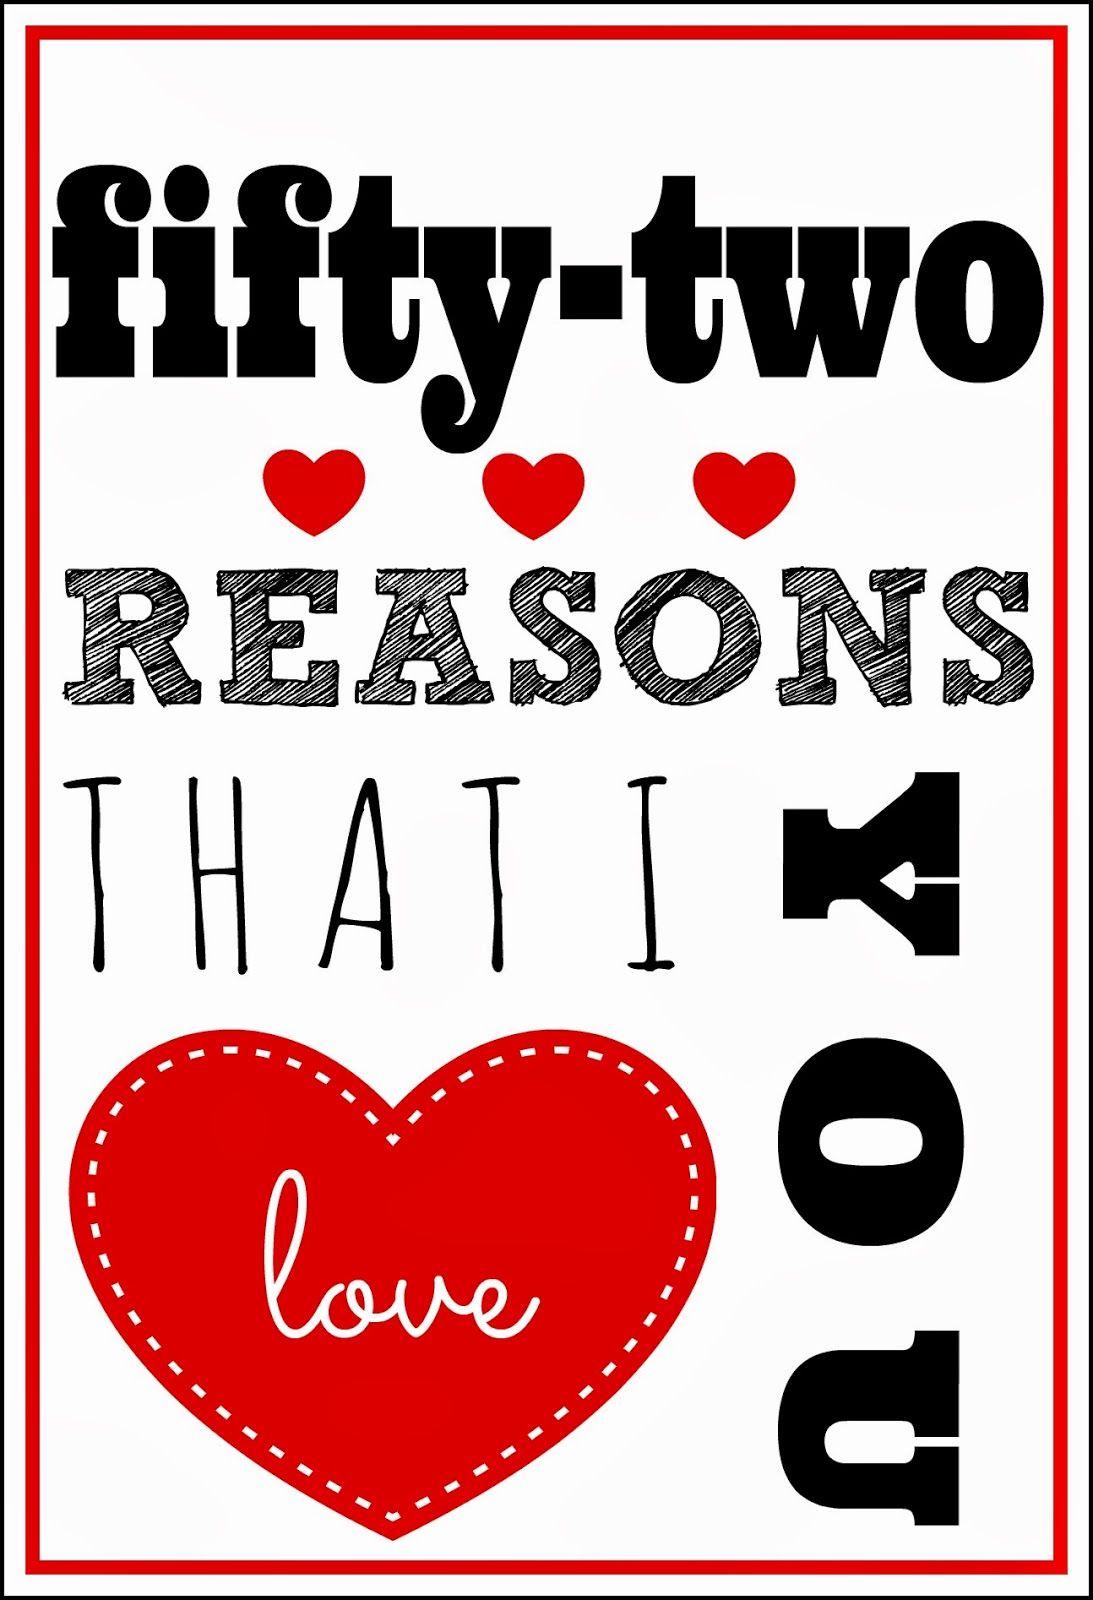 30 52 Reasons I Love You Template Free ~ Atabeyimedya - 52 Reasons Why I Love You Free Printable Template